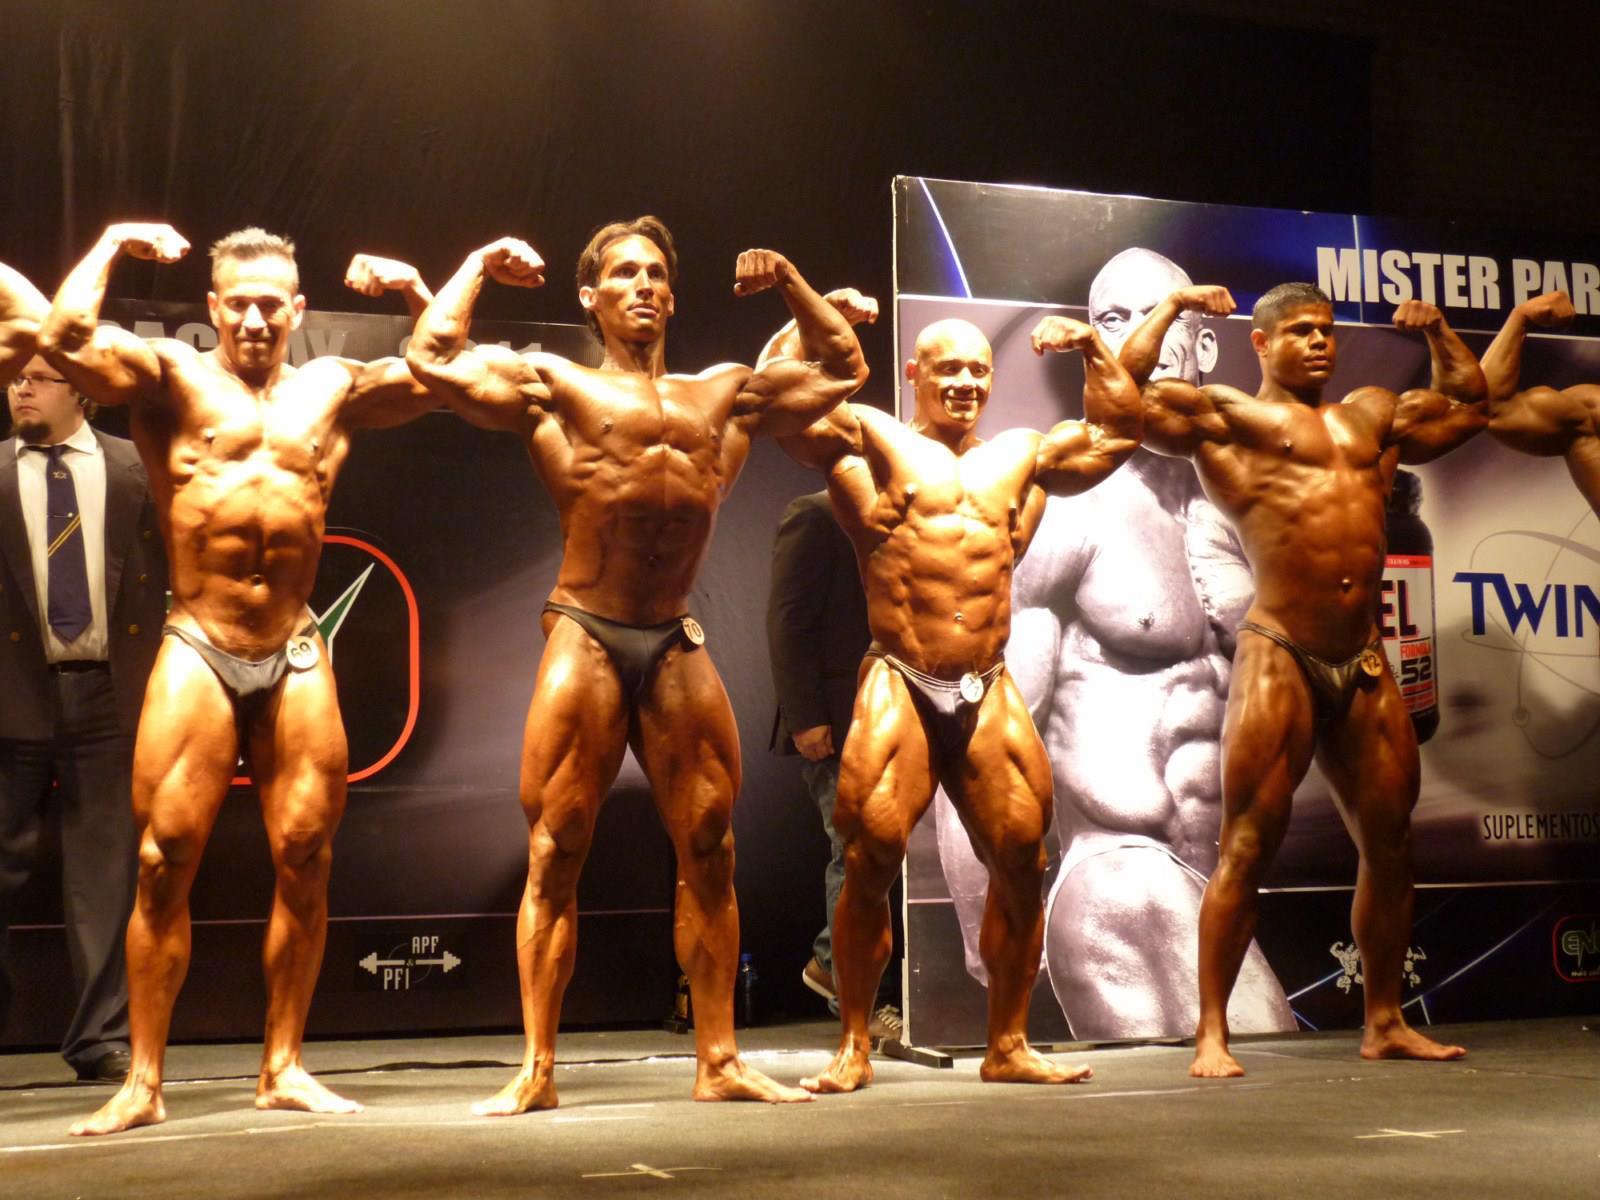 2011 Mister Paraguay